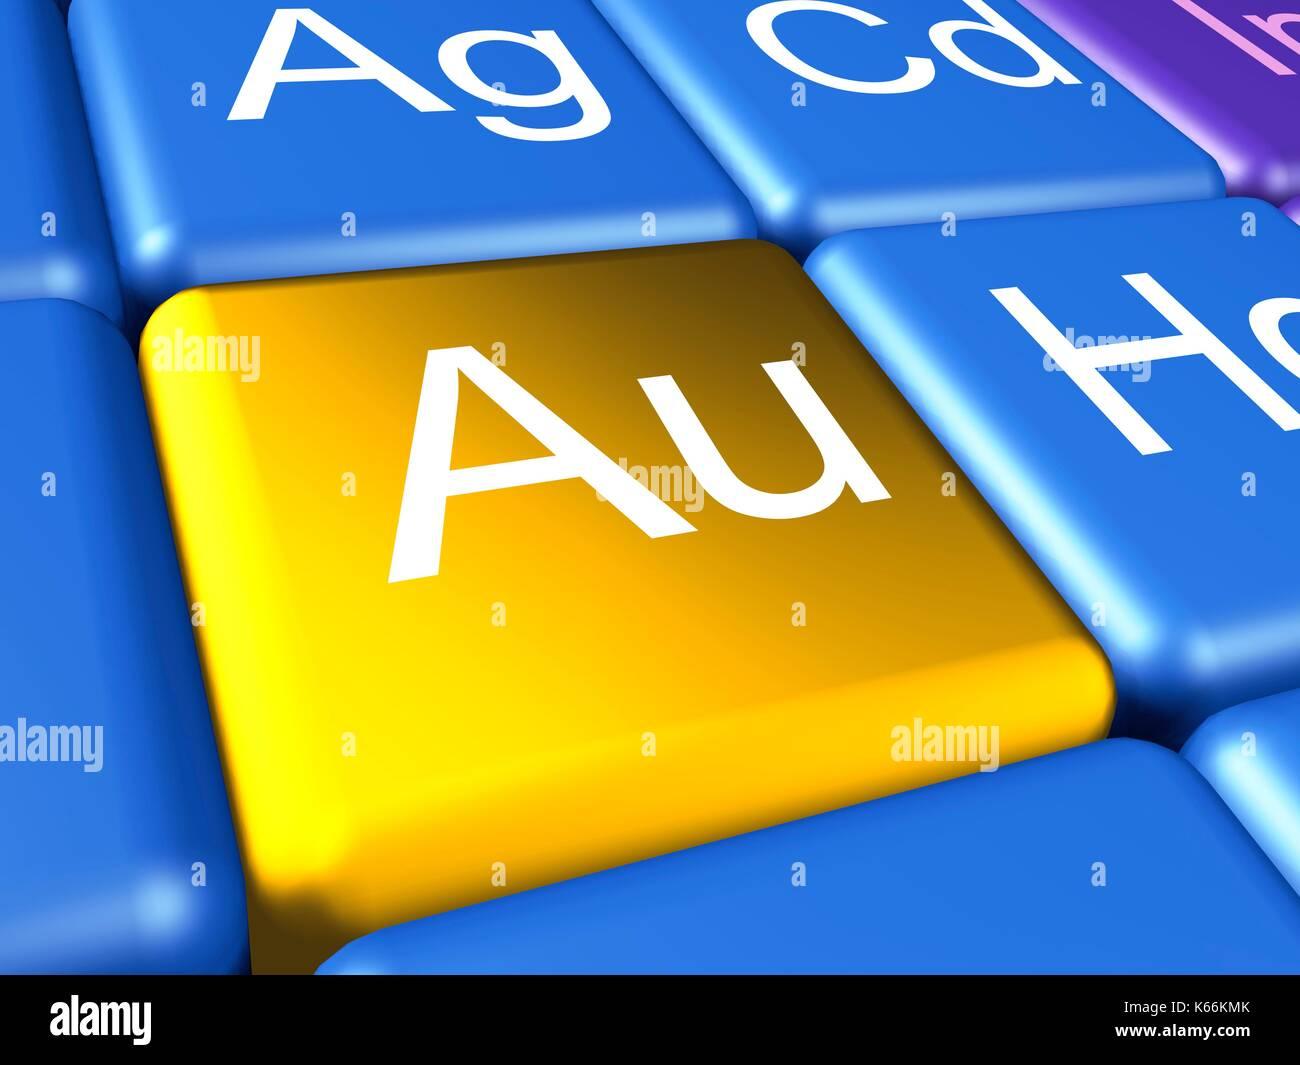 Computer artwork of a close up of the periodic table focussed on computer artwork of a close up of the periodic table focussed on the chemical element gold auaurum urtaz Gallery